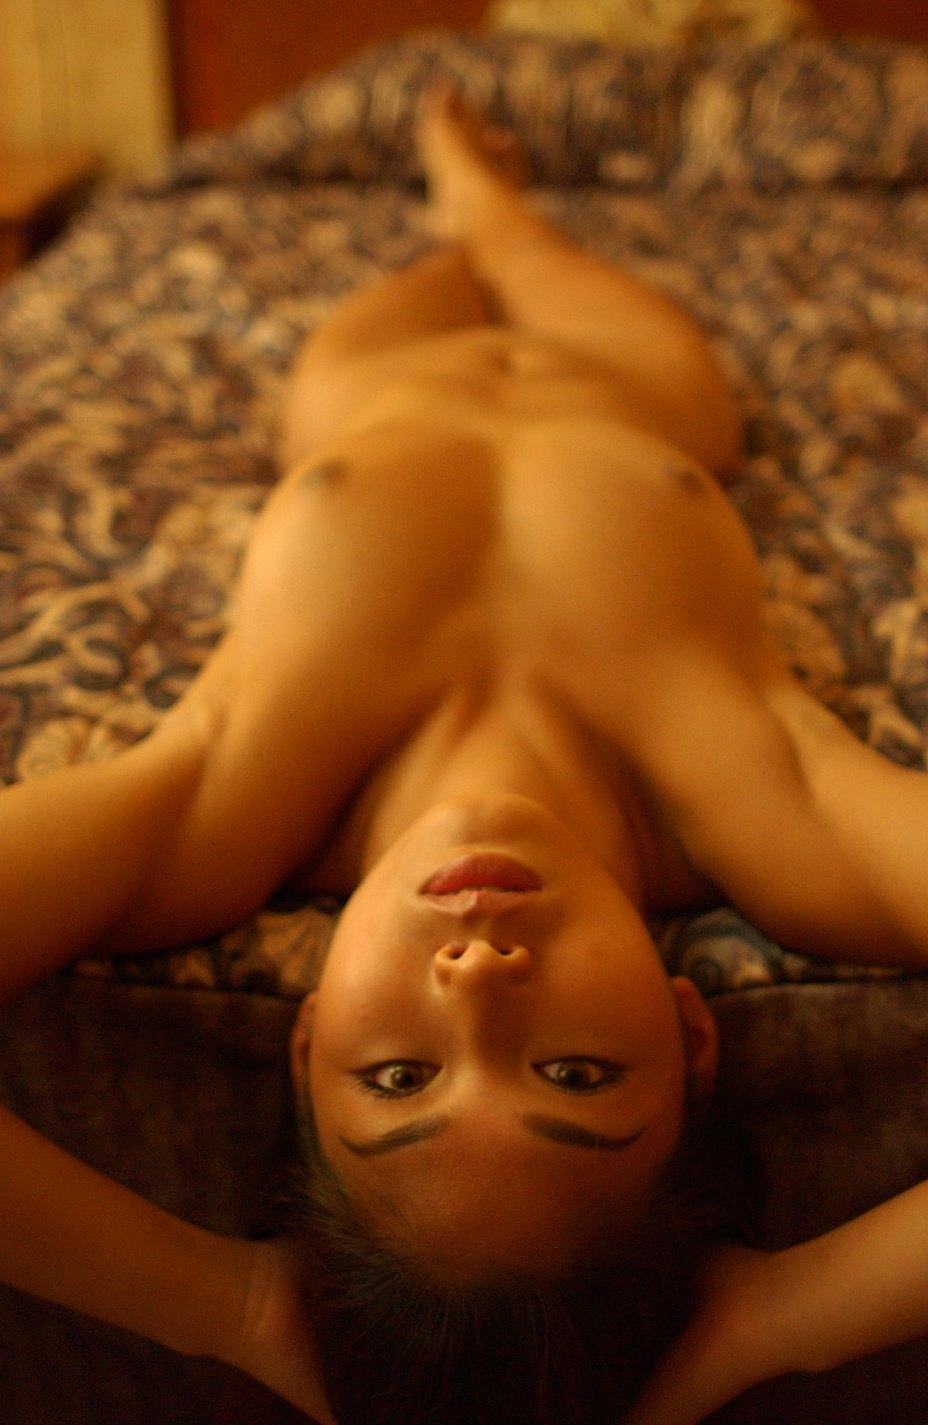 https://boobsmo.com/content/125/boobsmo_com_0000__41.jpg